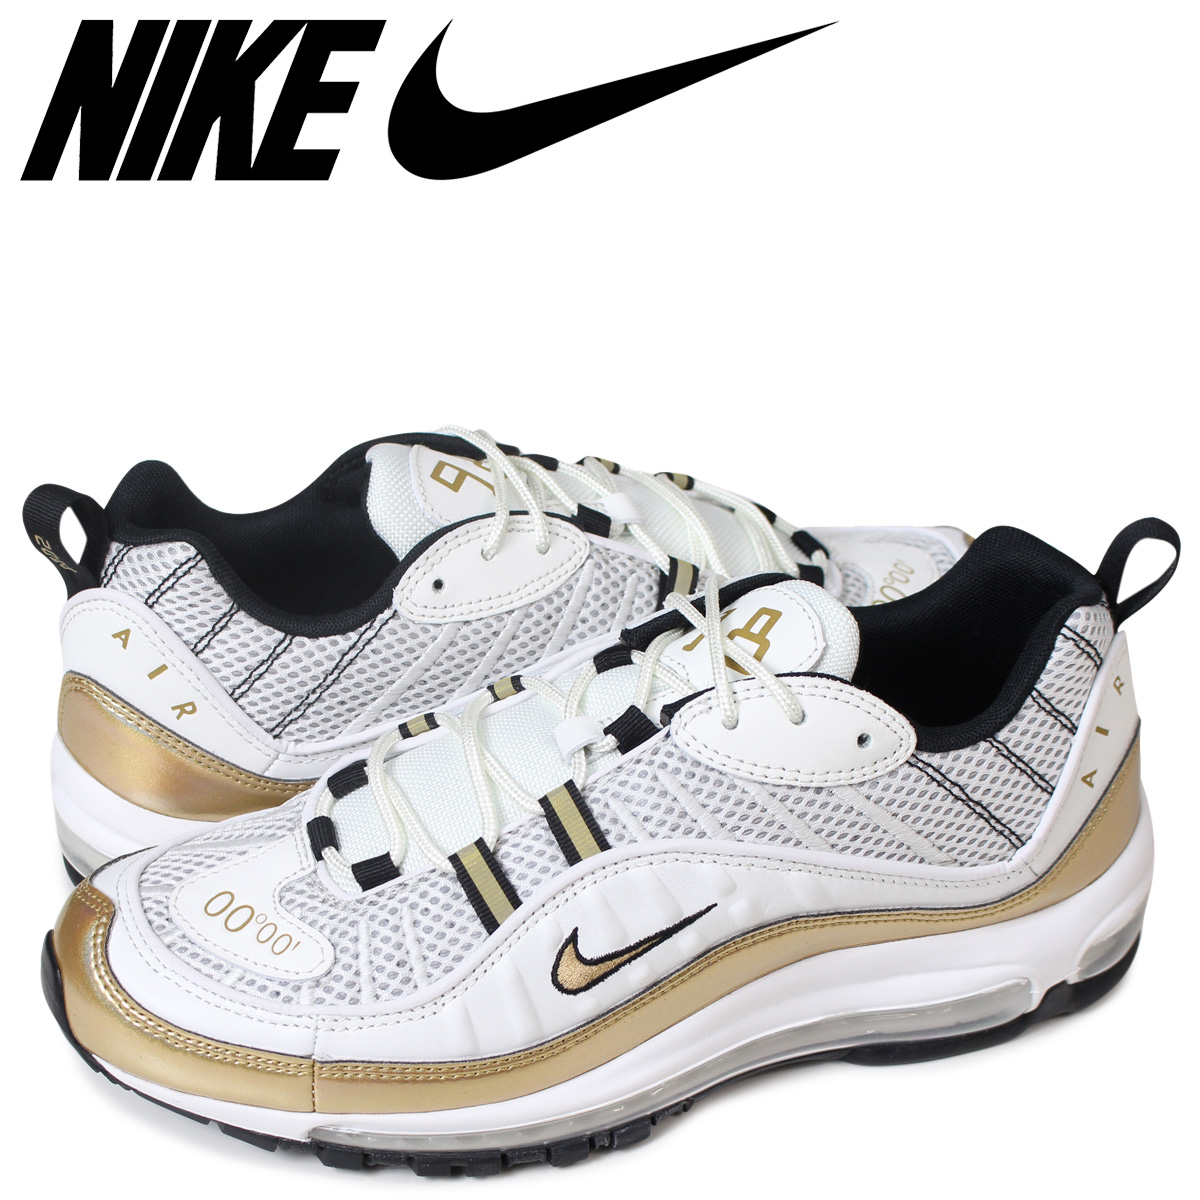 Sneakers Air Aj6302 Max 98 Gmt White185 Men Amax 100 Uk Ney Kie Nike LVSGqpUzM